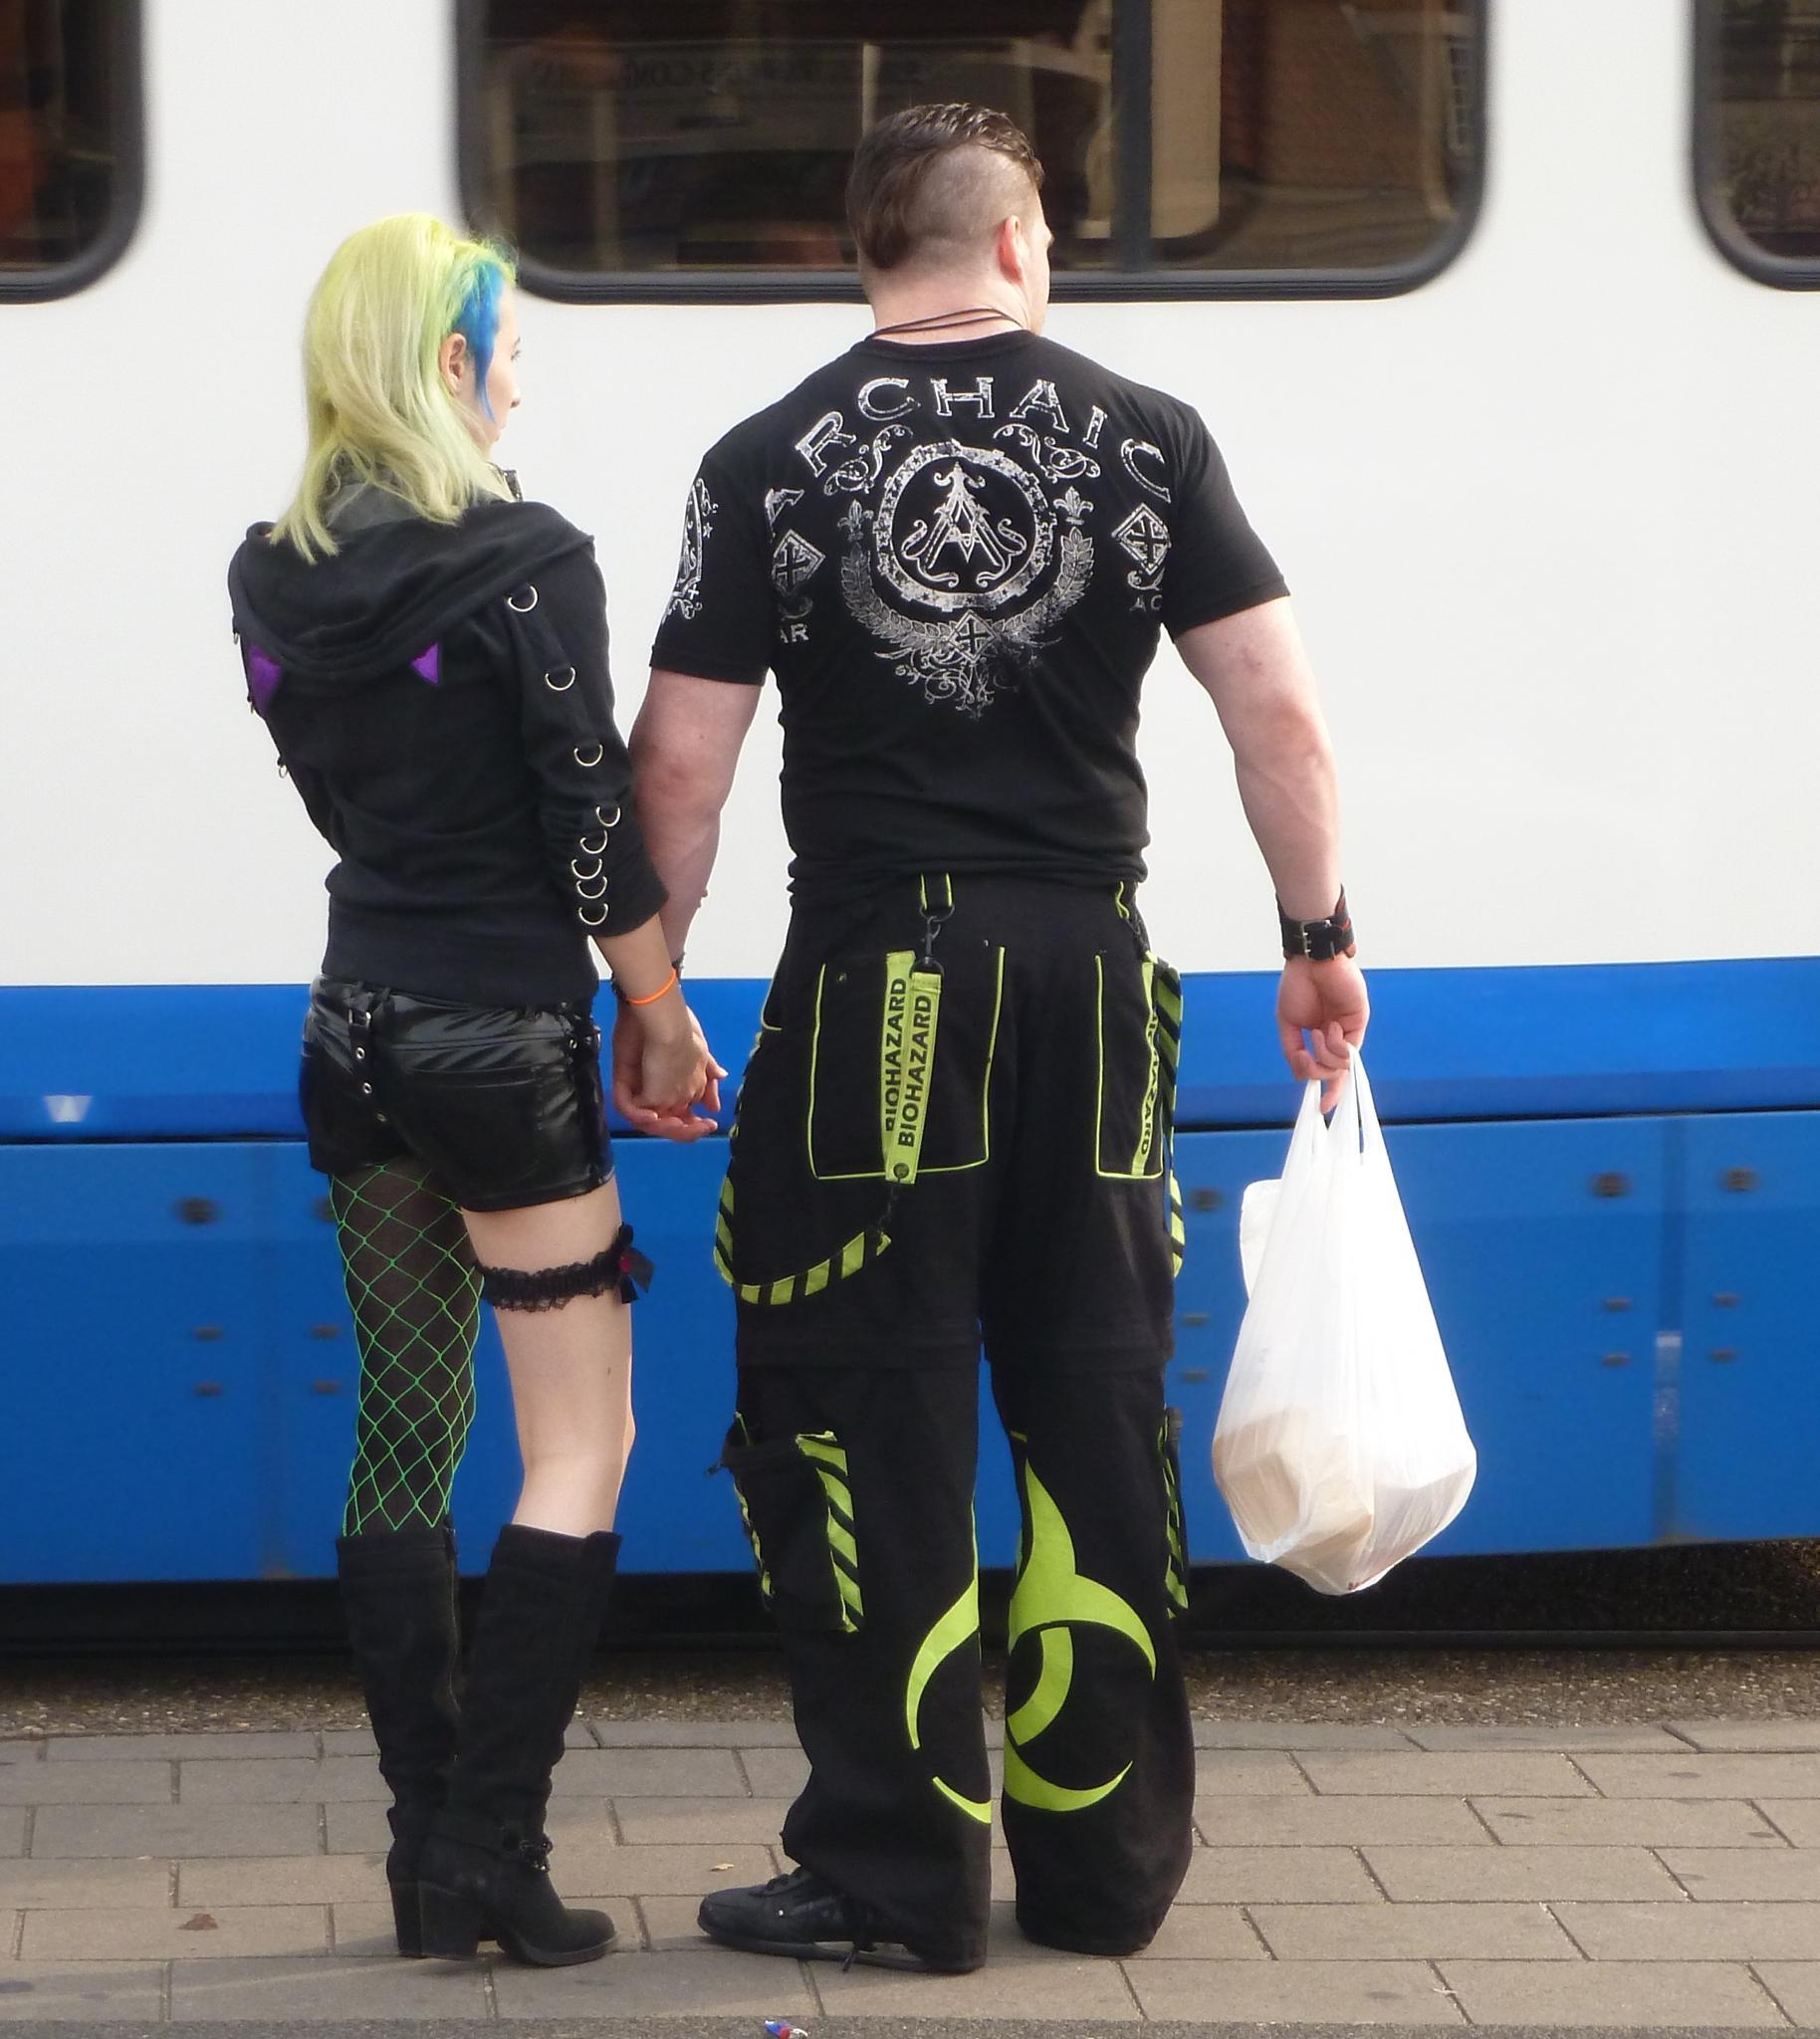 punk couple in Amsterdam by alexandra.tsamimousa